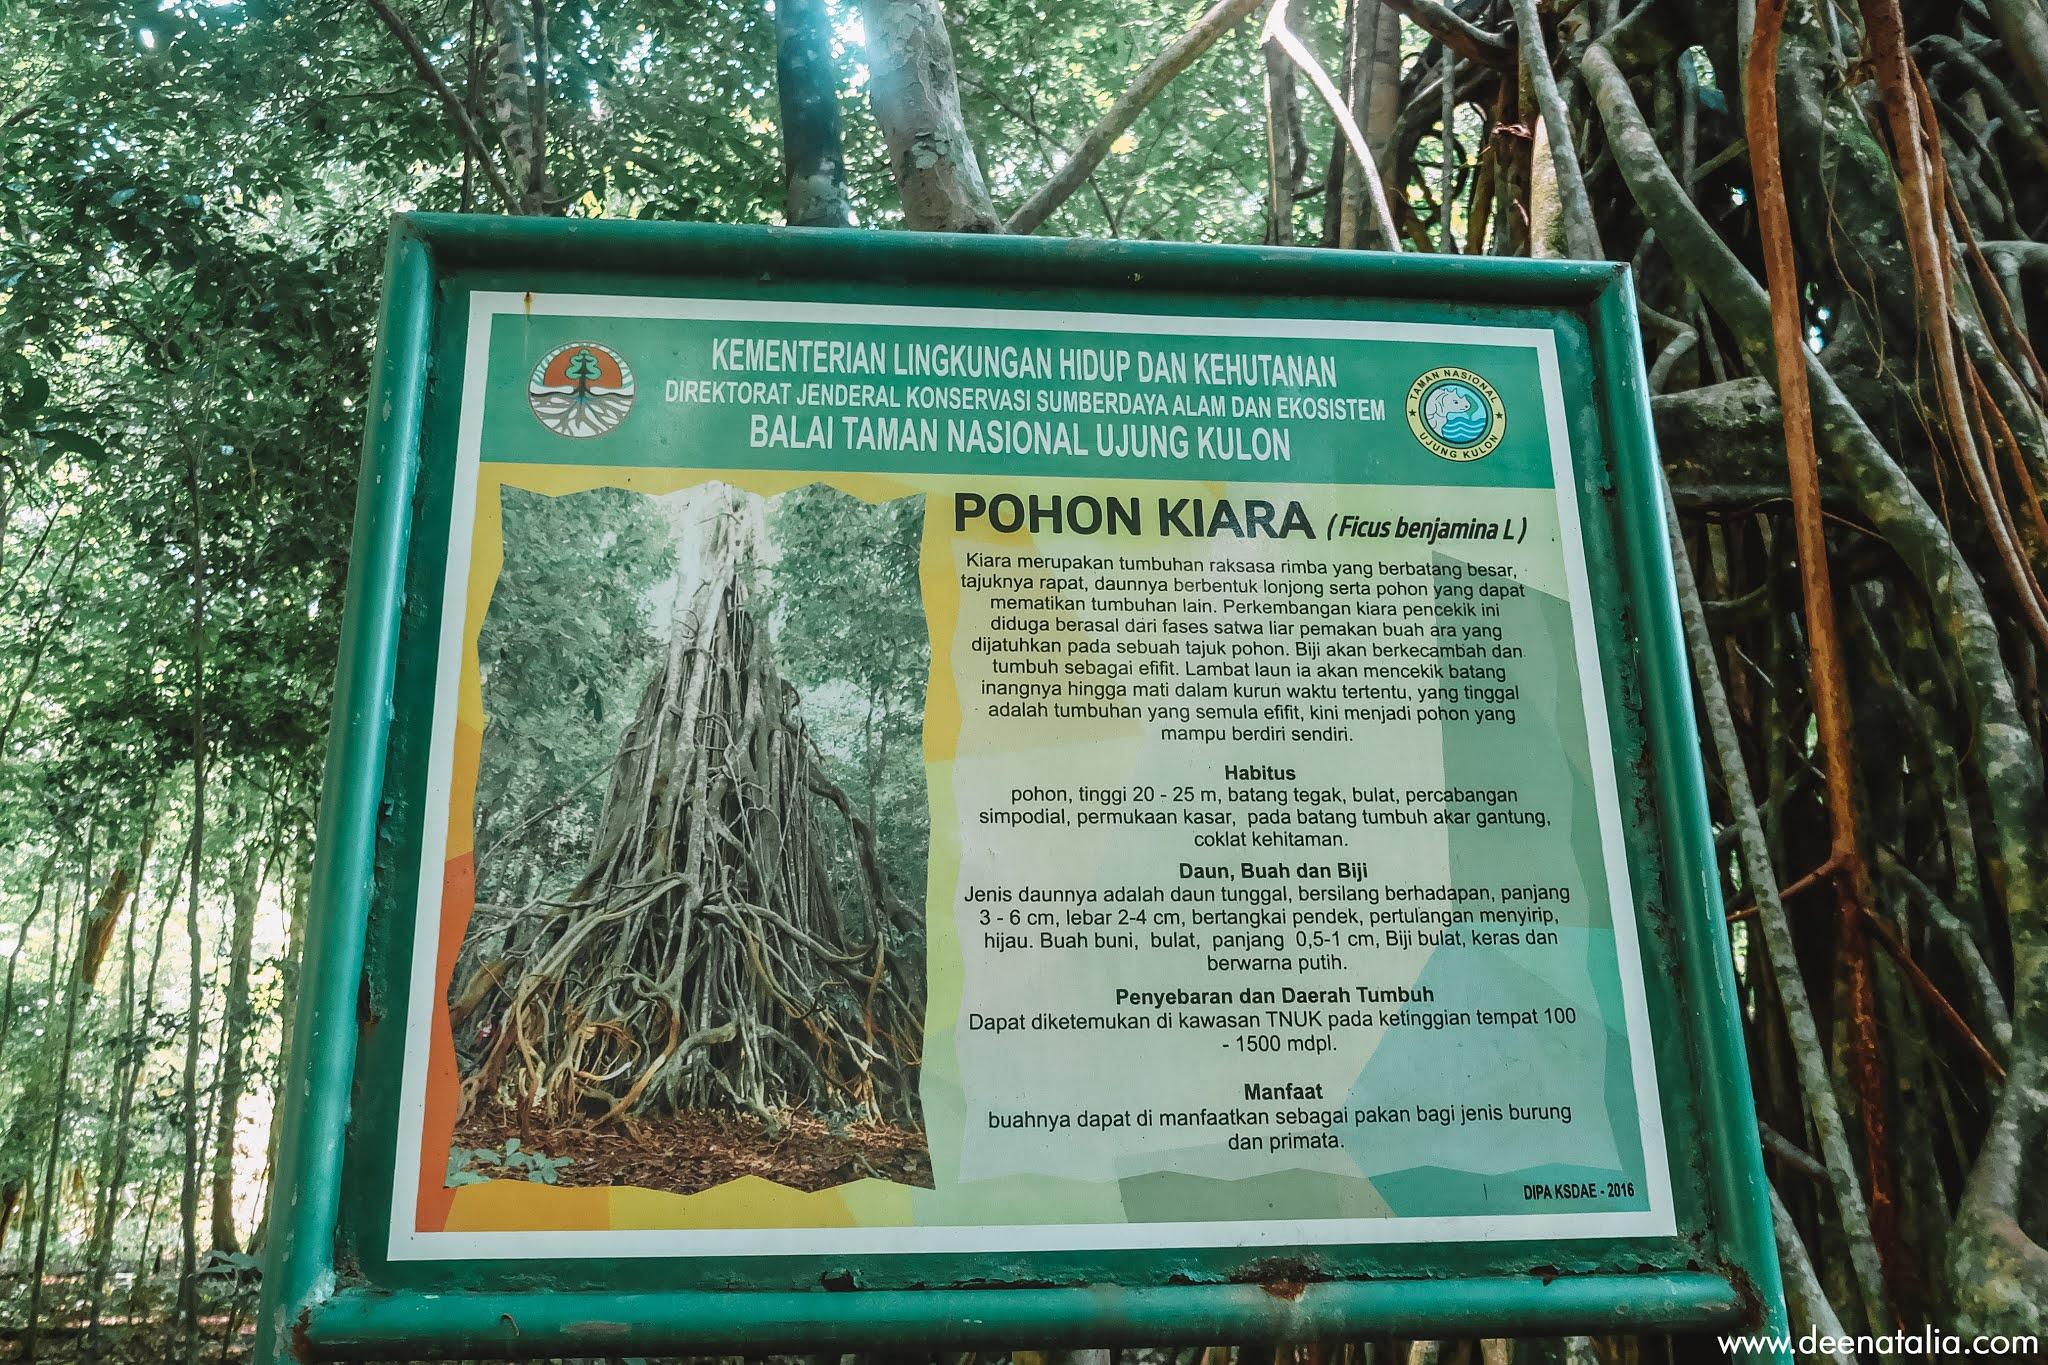 Pohon Kiara Karang Copong Ujung Kulon